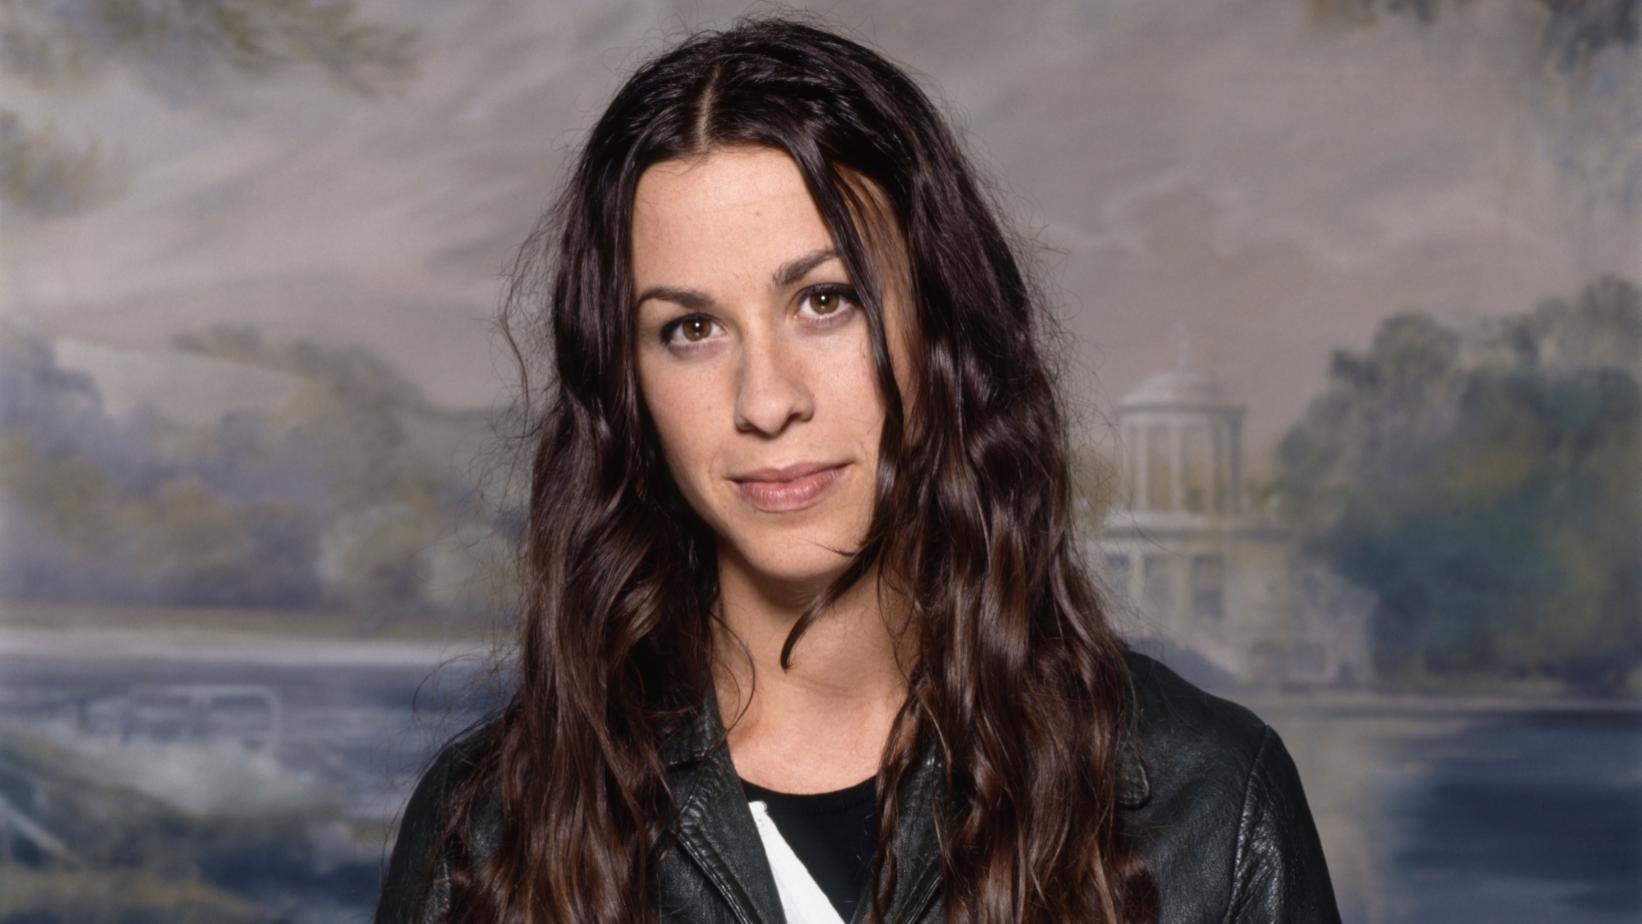 Anorexic Celebrities - Alanis Morissette